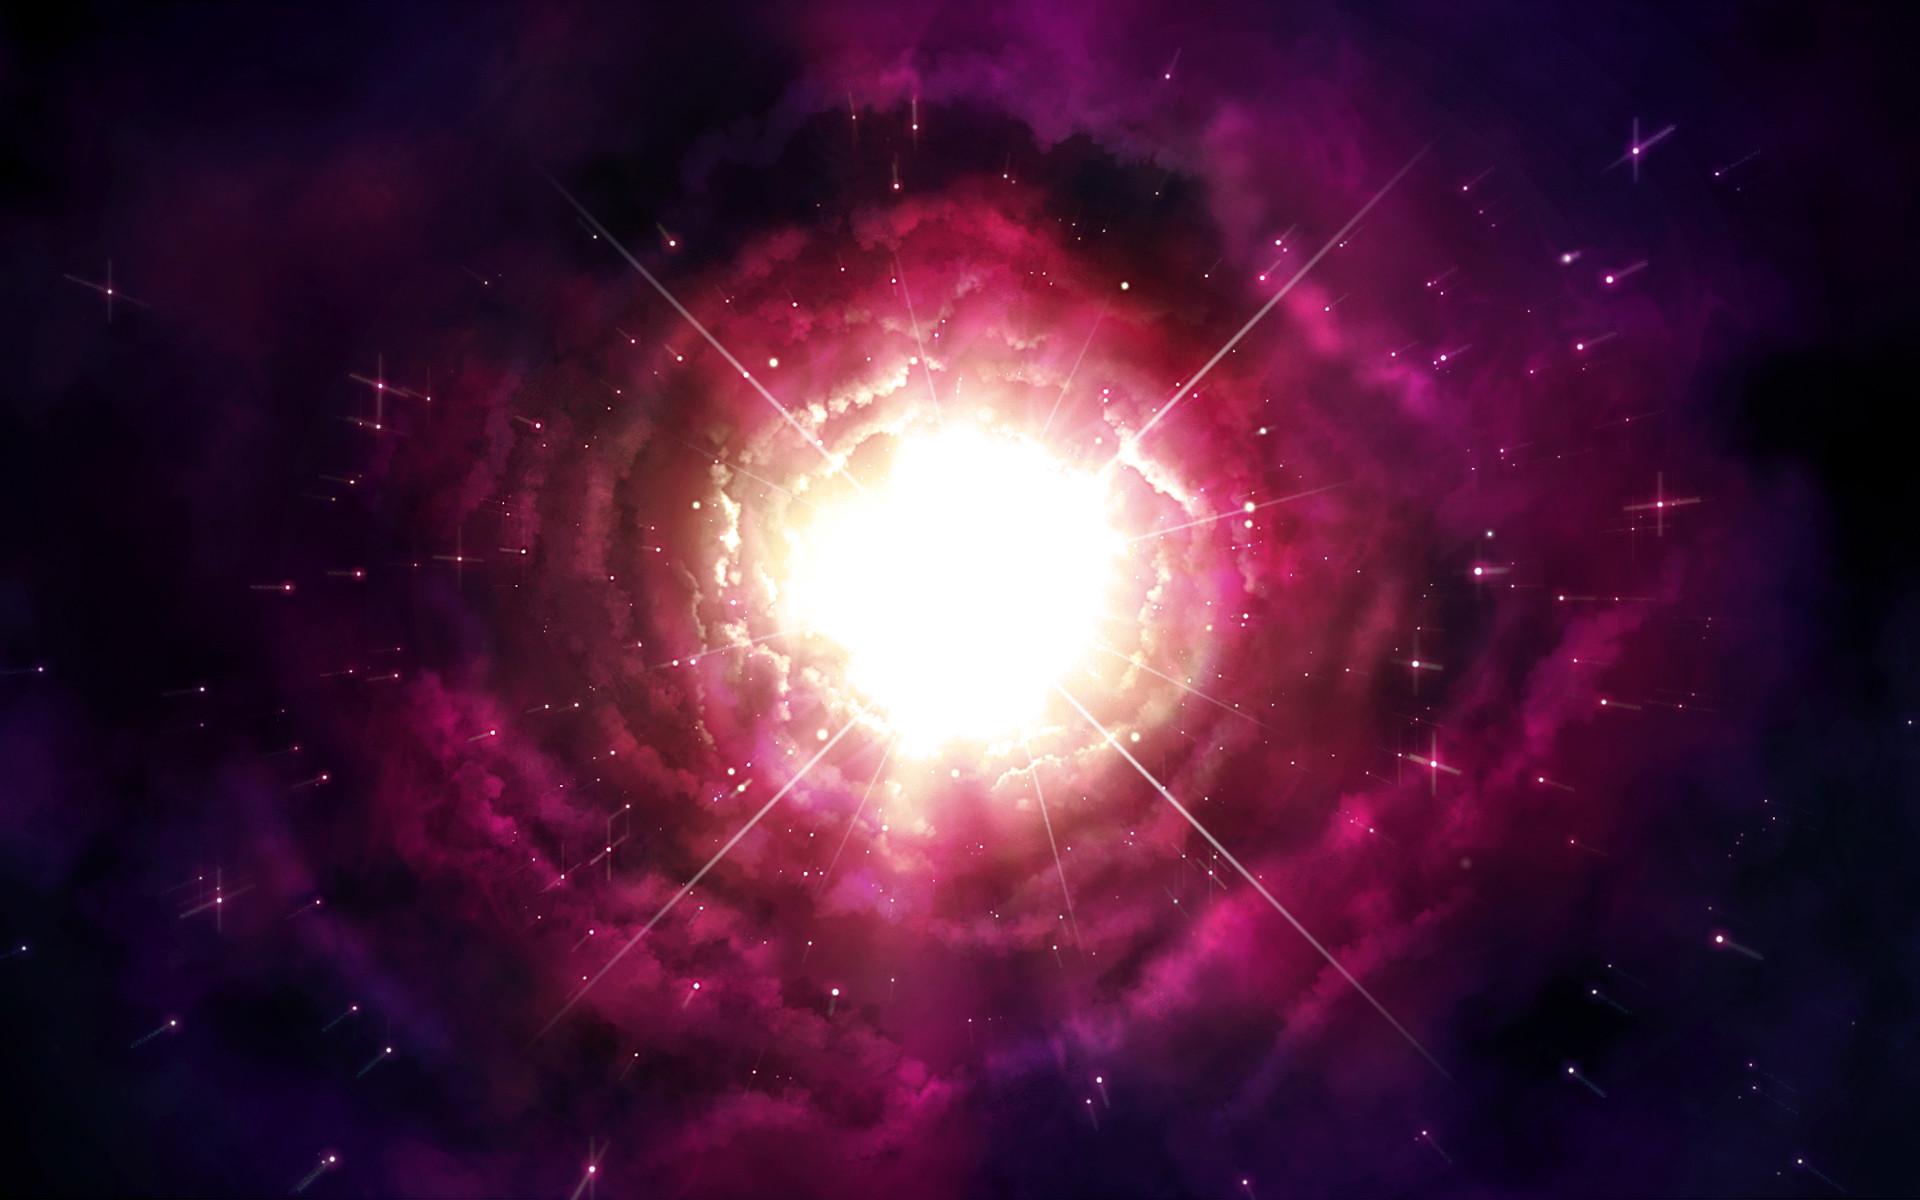 Pillars Of Creation Wallpaper Hd: Eagle Nebula Wallpaper HD (63+ Images